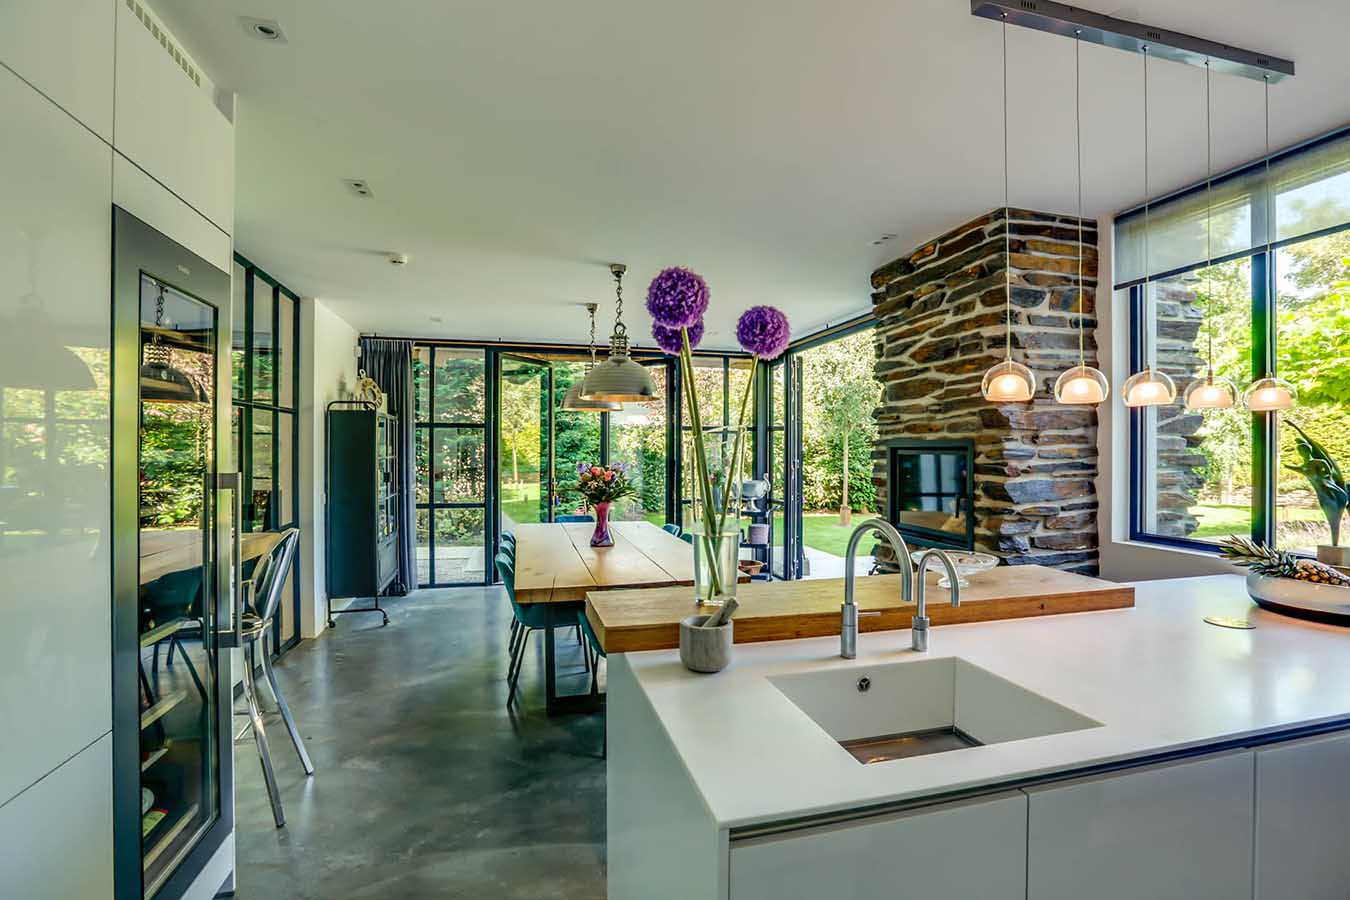 Interieur keuken styling